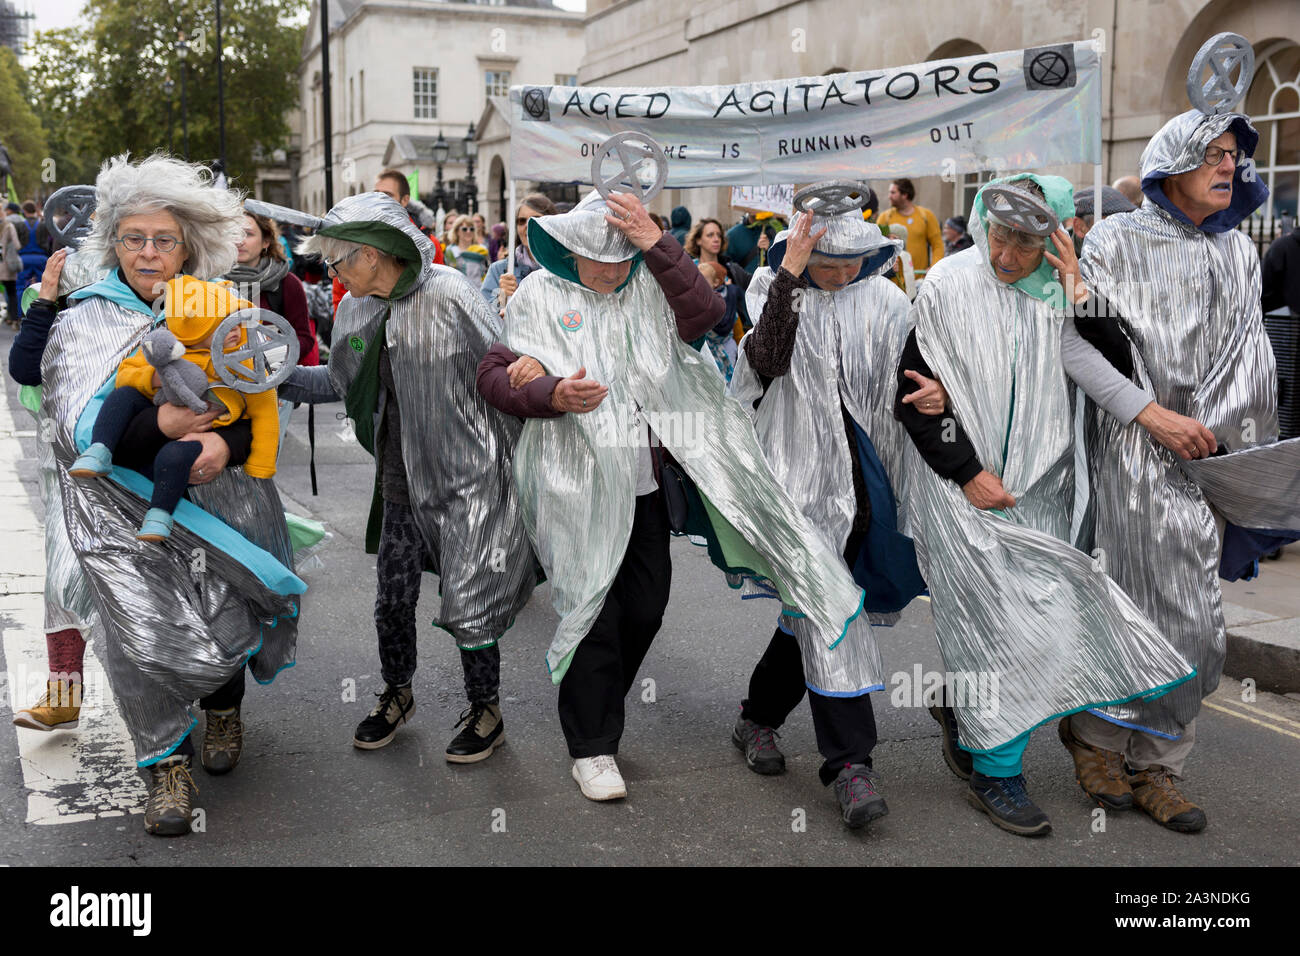 elderly-environmental-activists-protest-